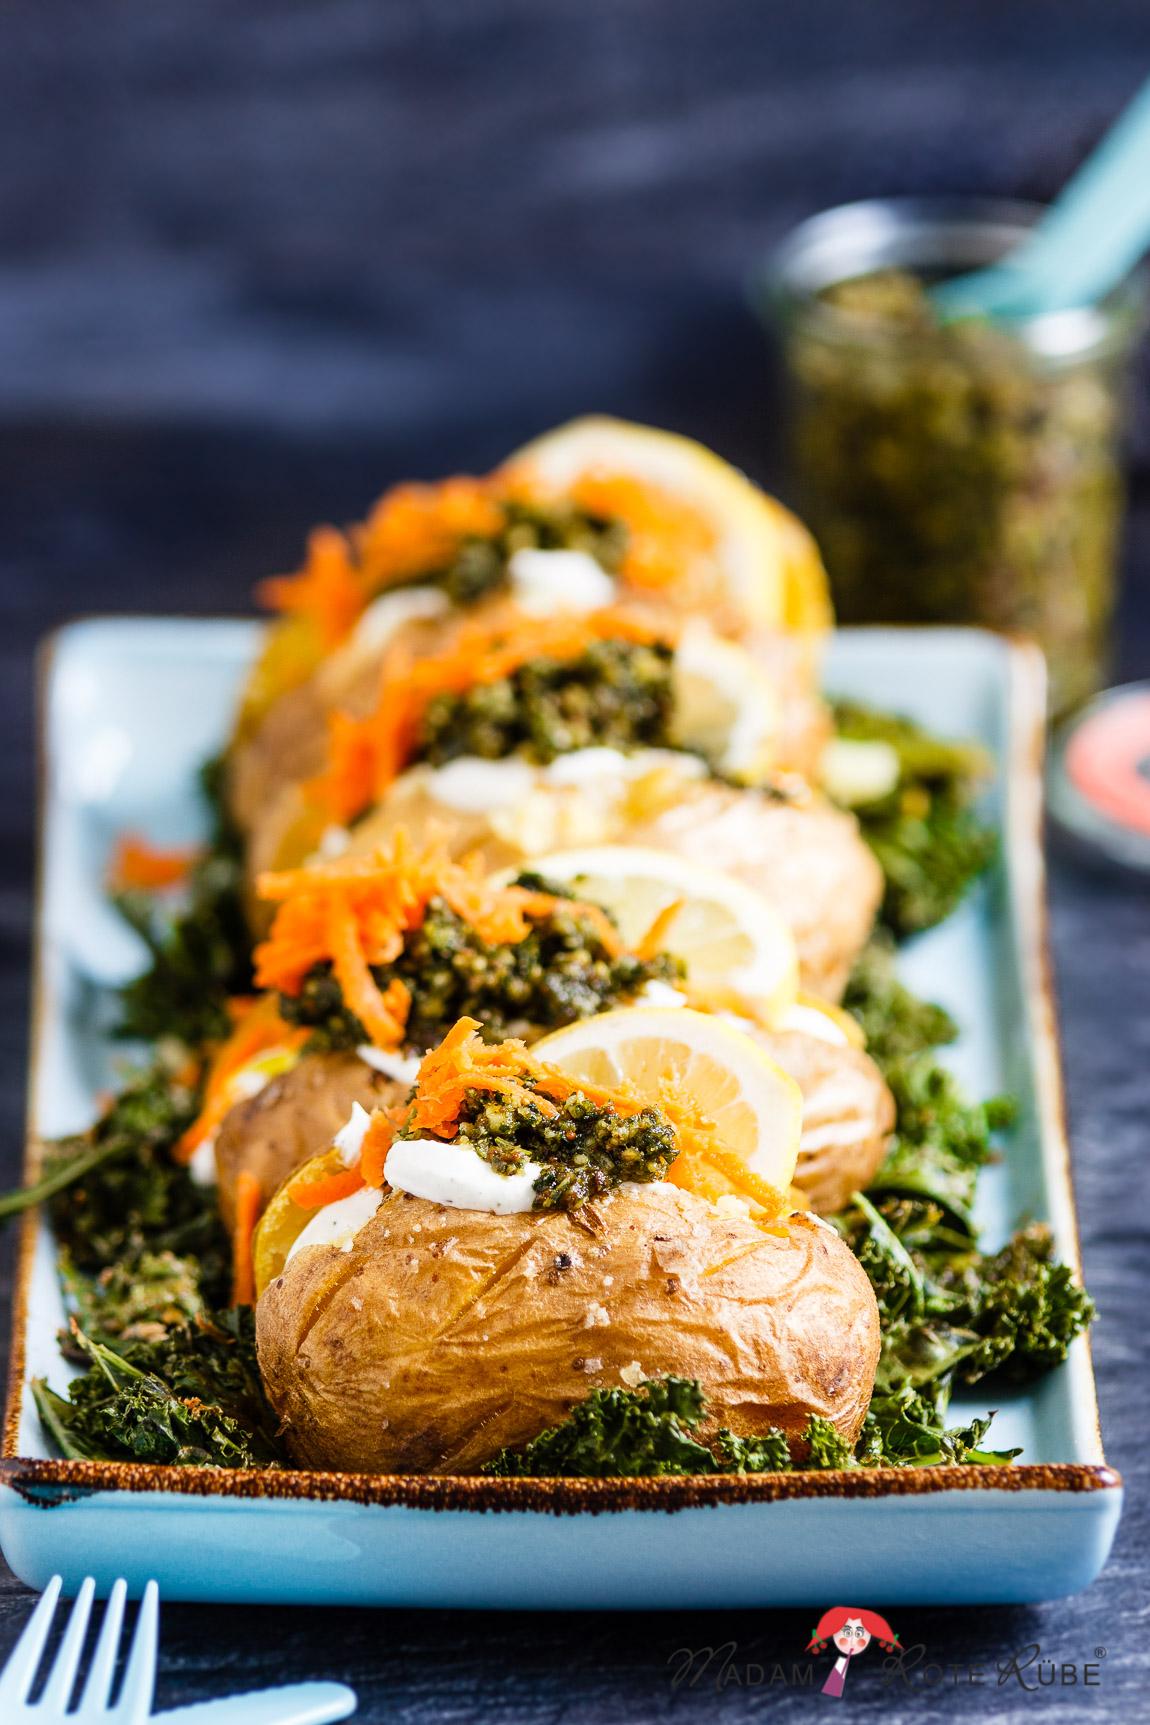 Madam Rote Rübe - Ofenkartoffeln mit Grünkohlpesto